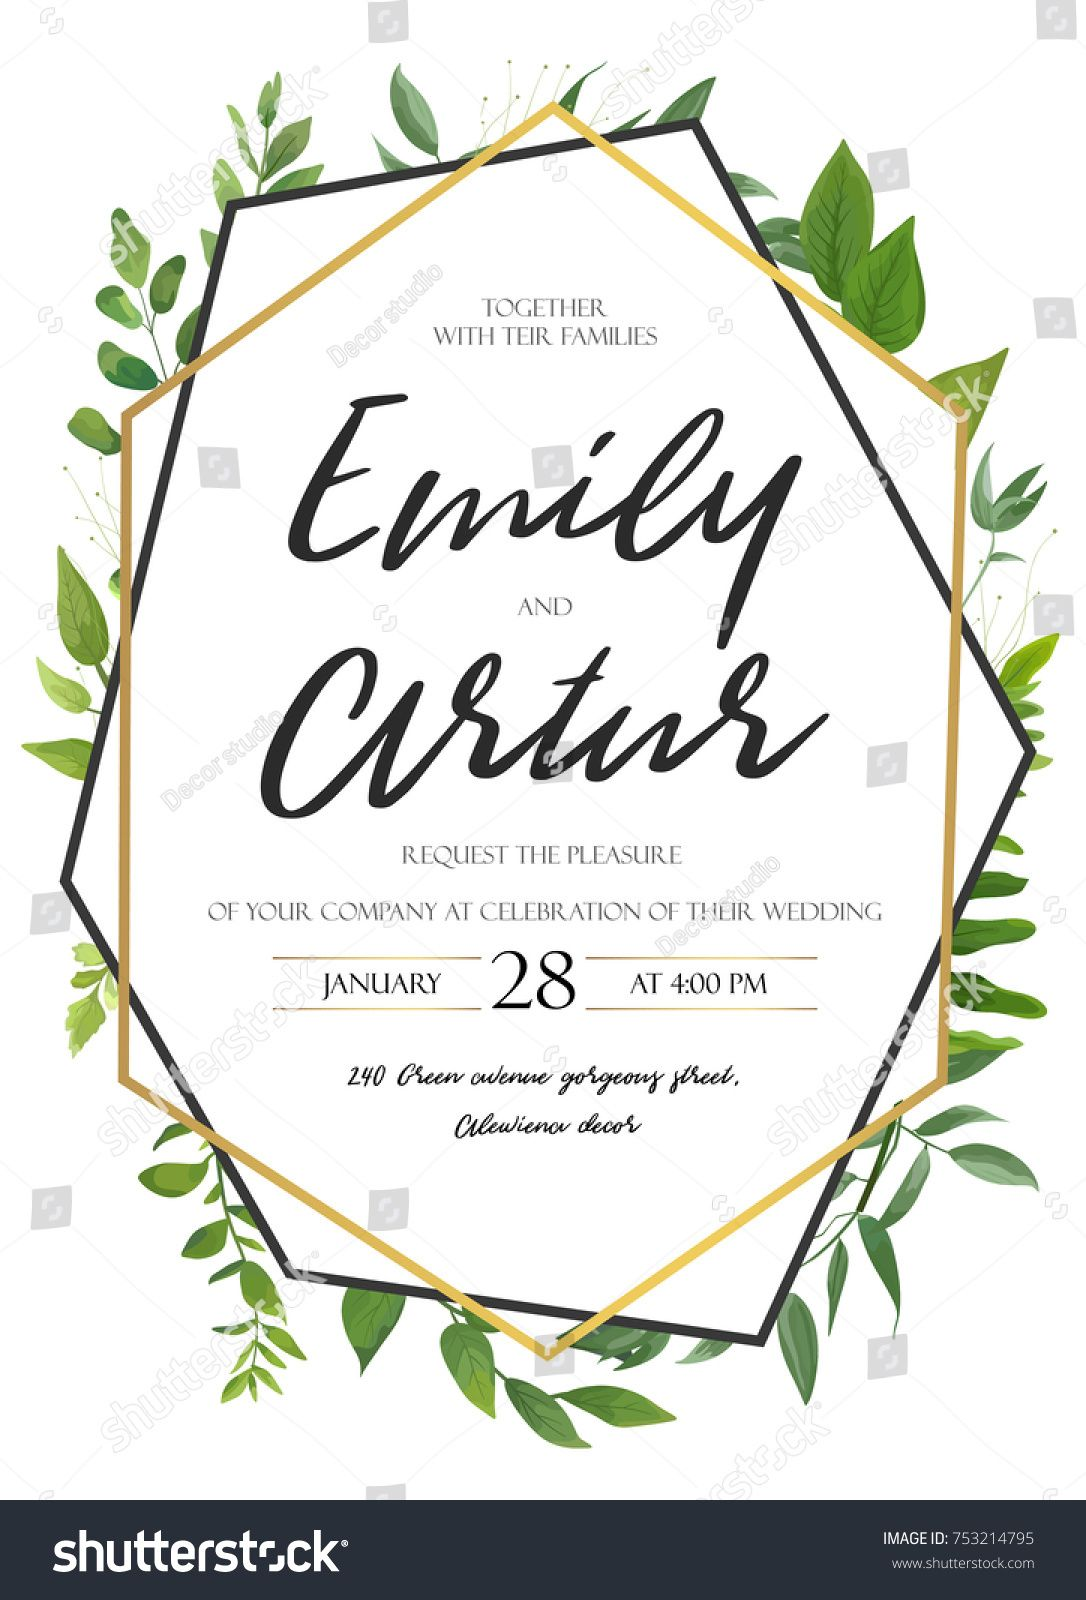 Vector Wedding Invite Invitation Save The Date Floral Card Design